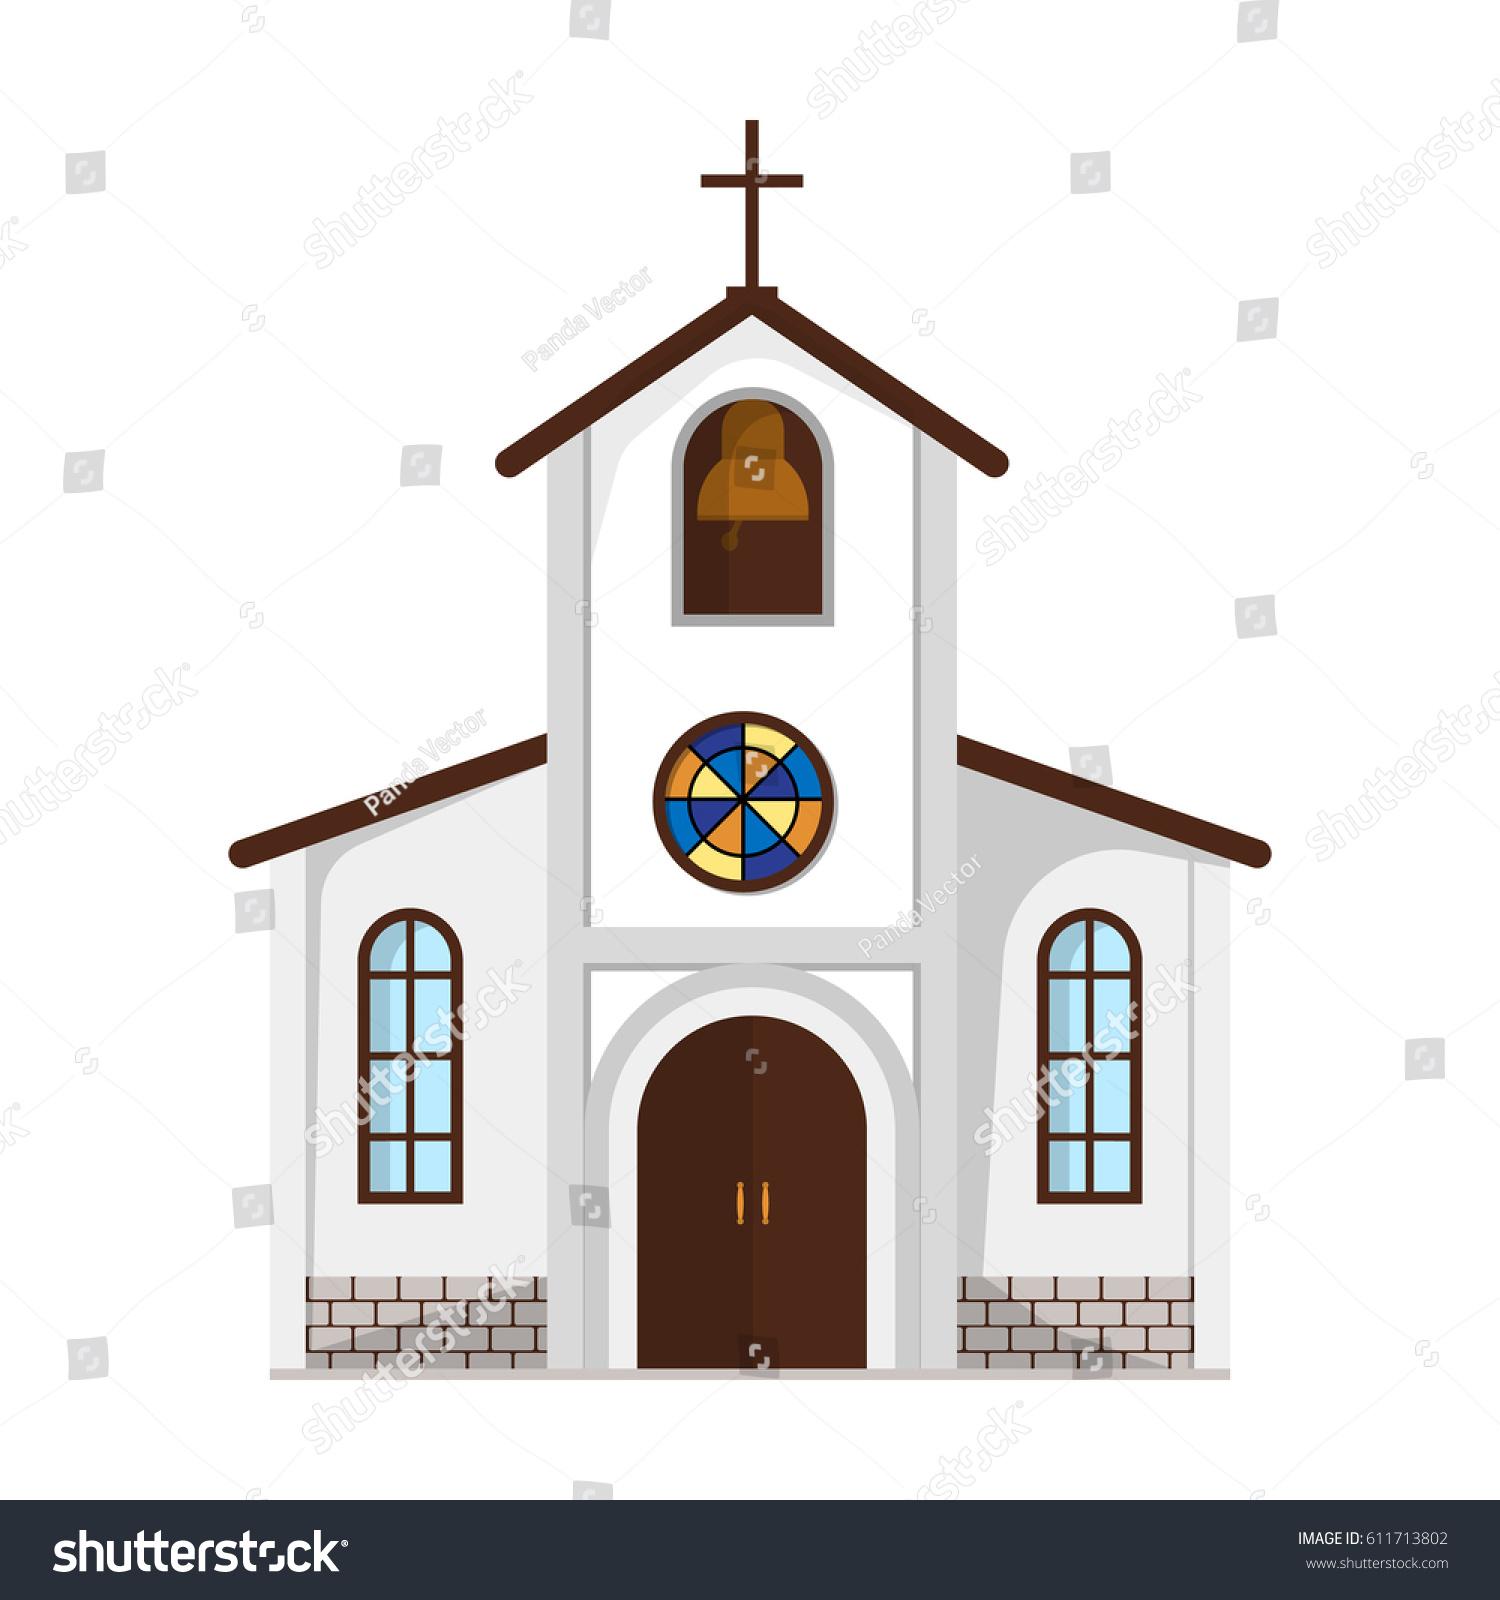 Church which bride groom conduct rite stock illustration 611713802 church in which the bride and groom conduct a rite before the wedding wedding single biocorpaavc